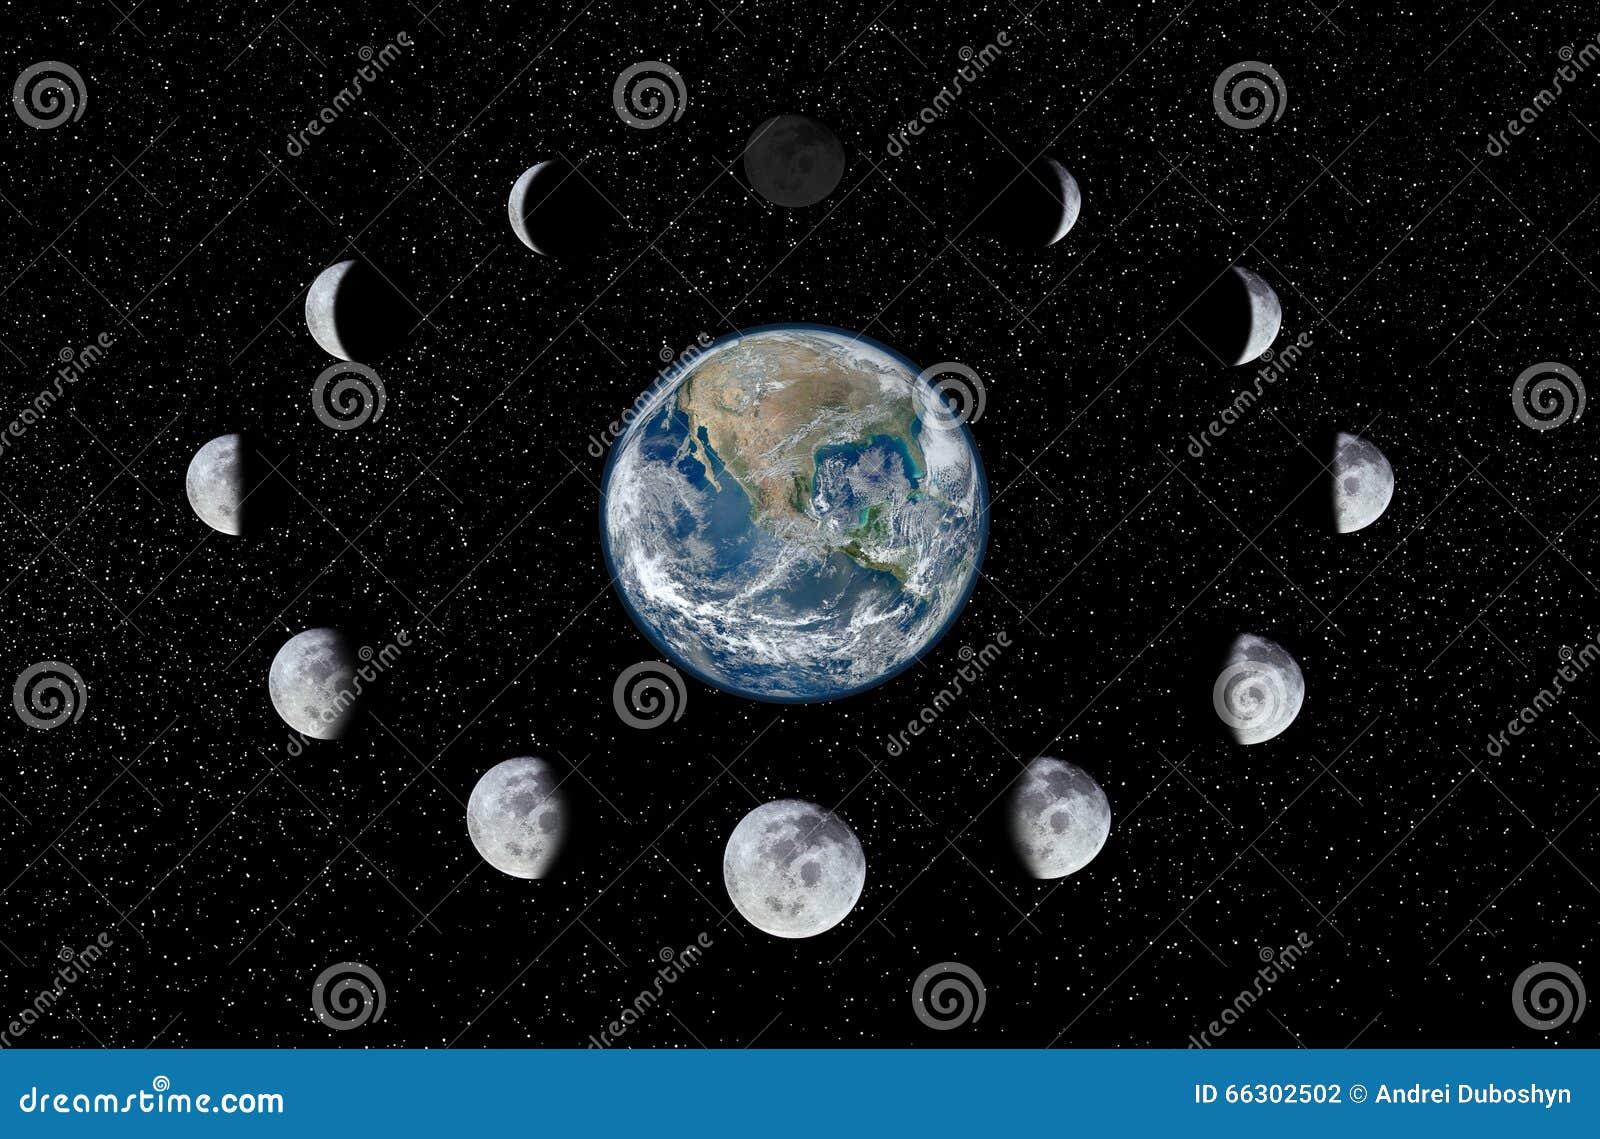 nasa lunar cycles - photo #13